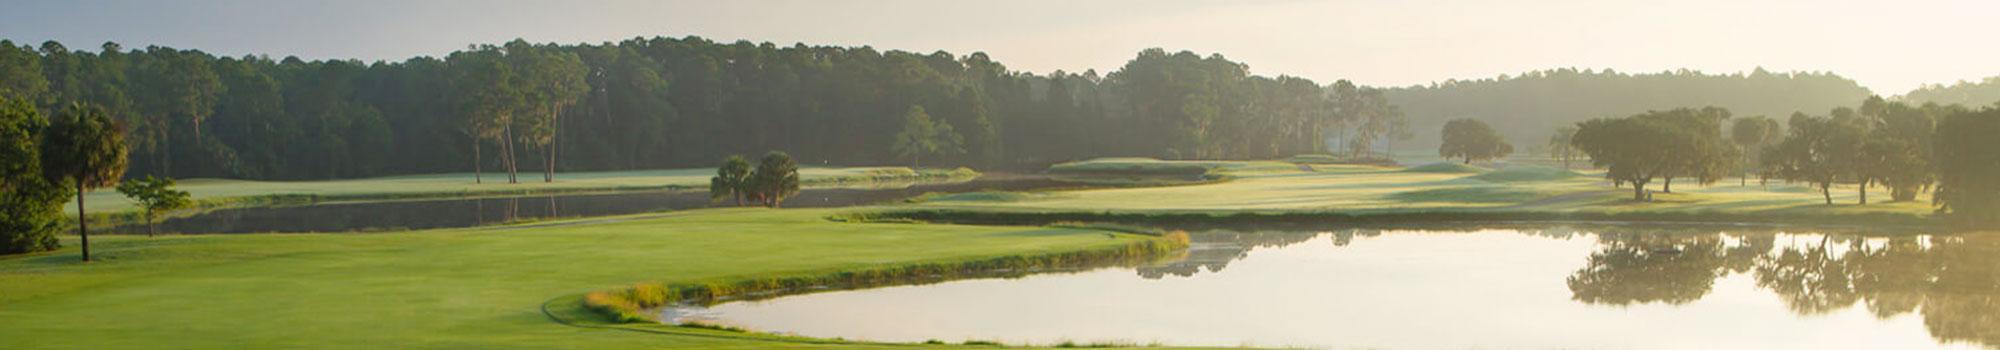 Walt Disney World Golf Course | Specials - Sunrise 9 | Orlando, FL